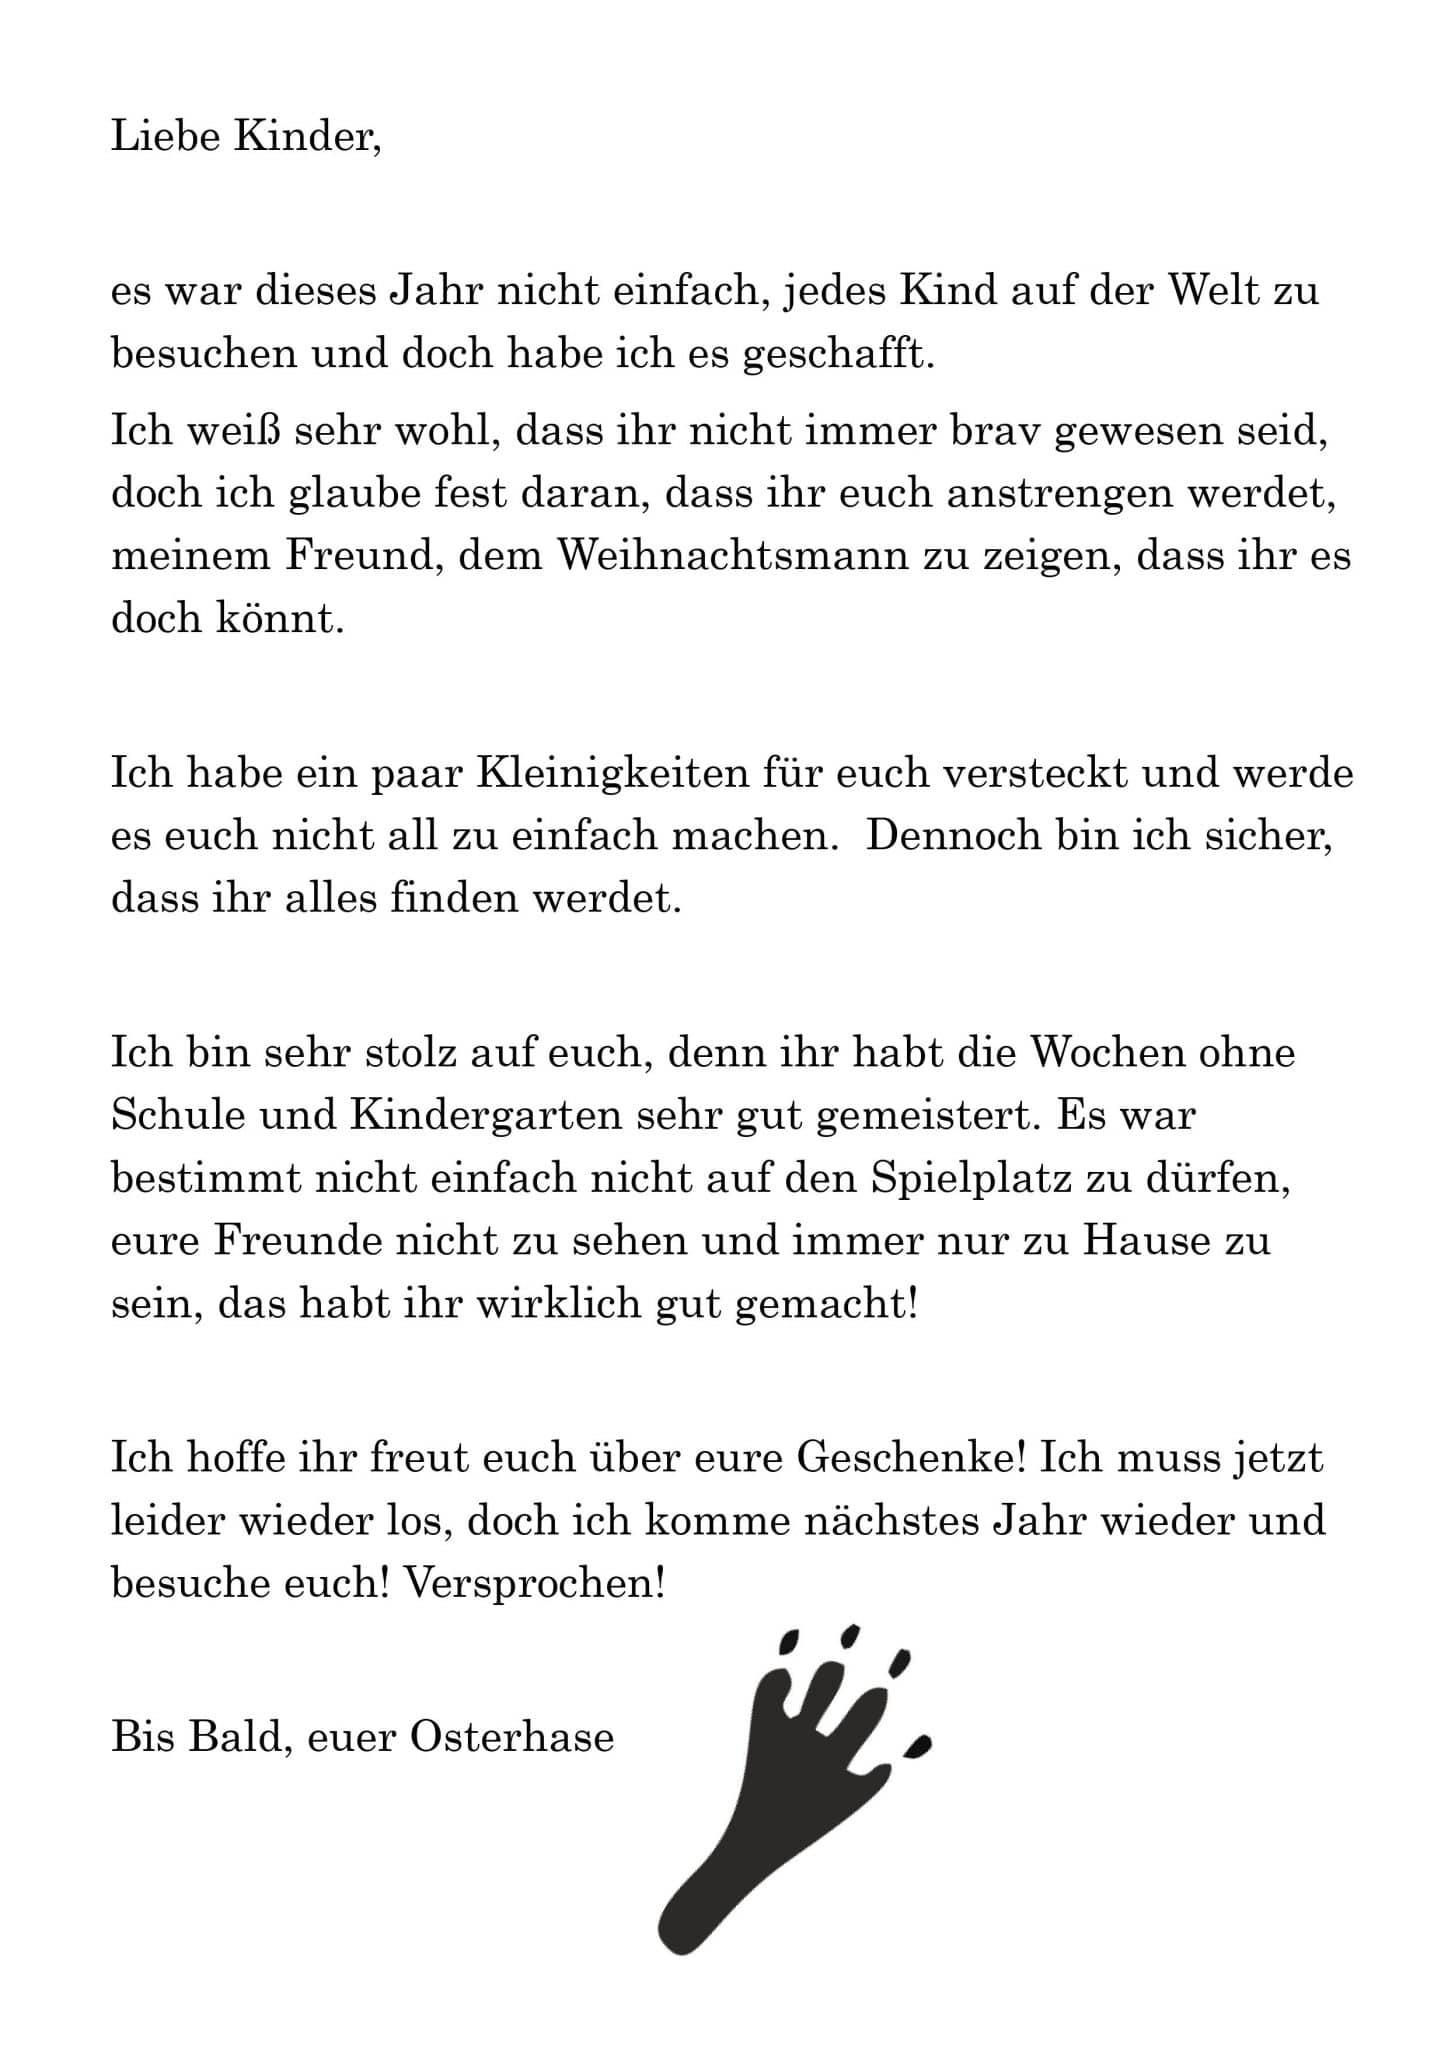 Liebe Frau Hase Lwl Blog Kommission Alltagskulturforschung 13